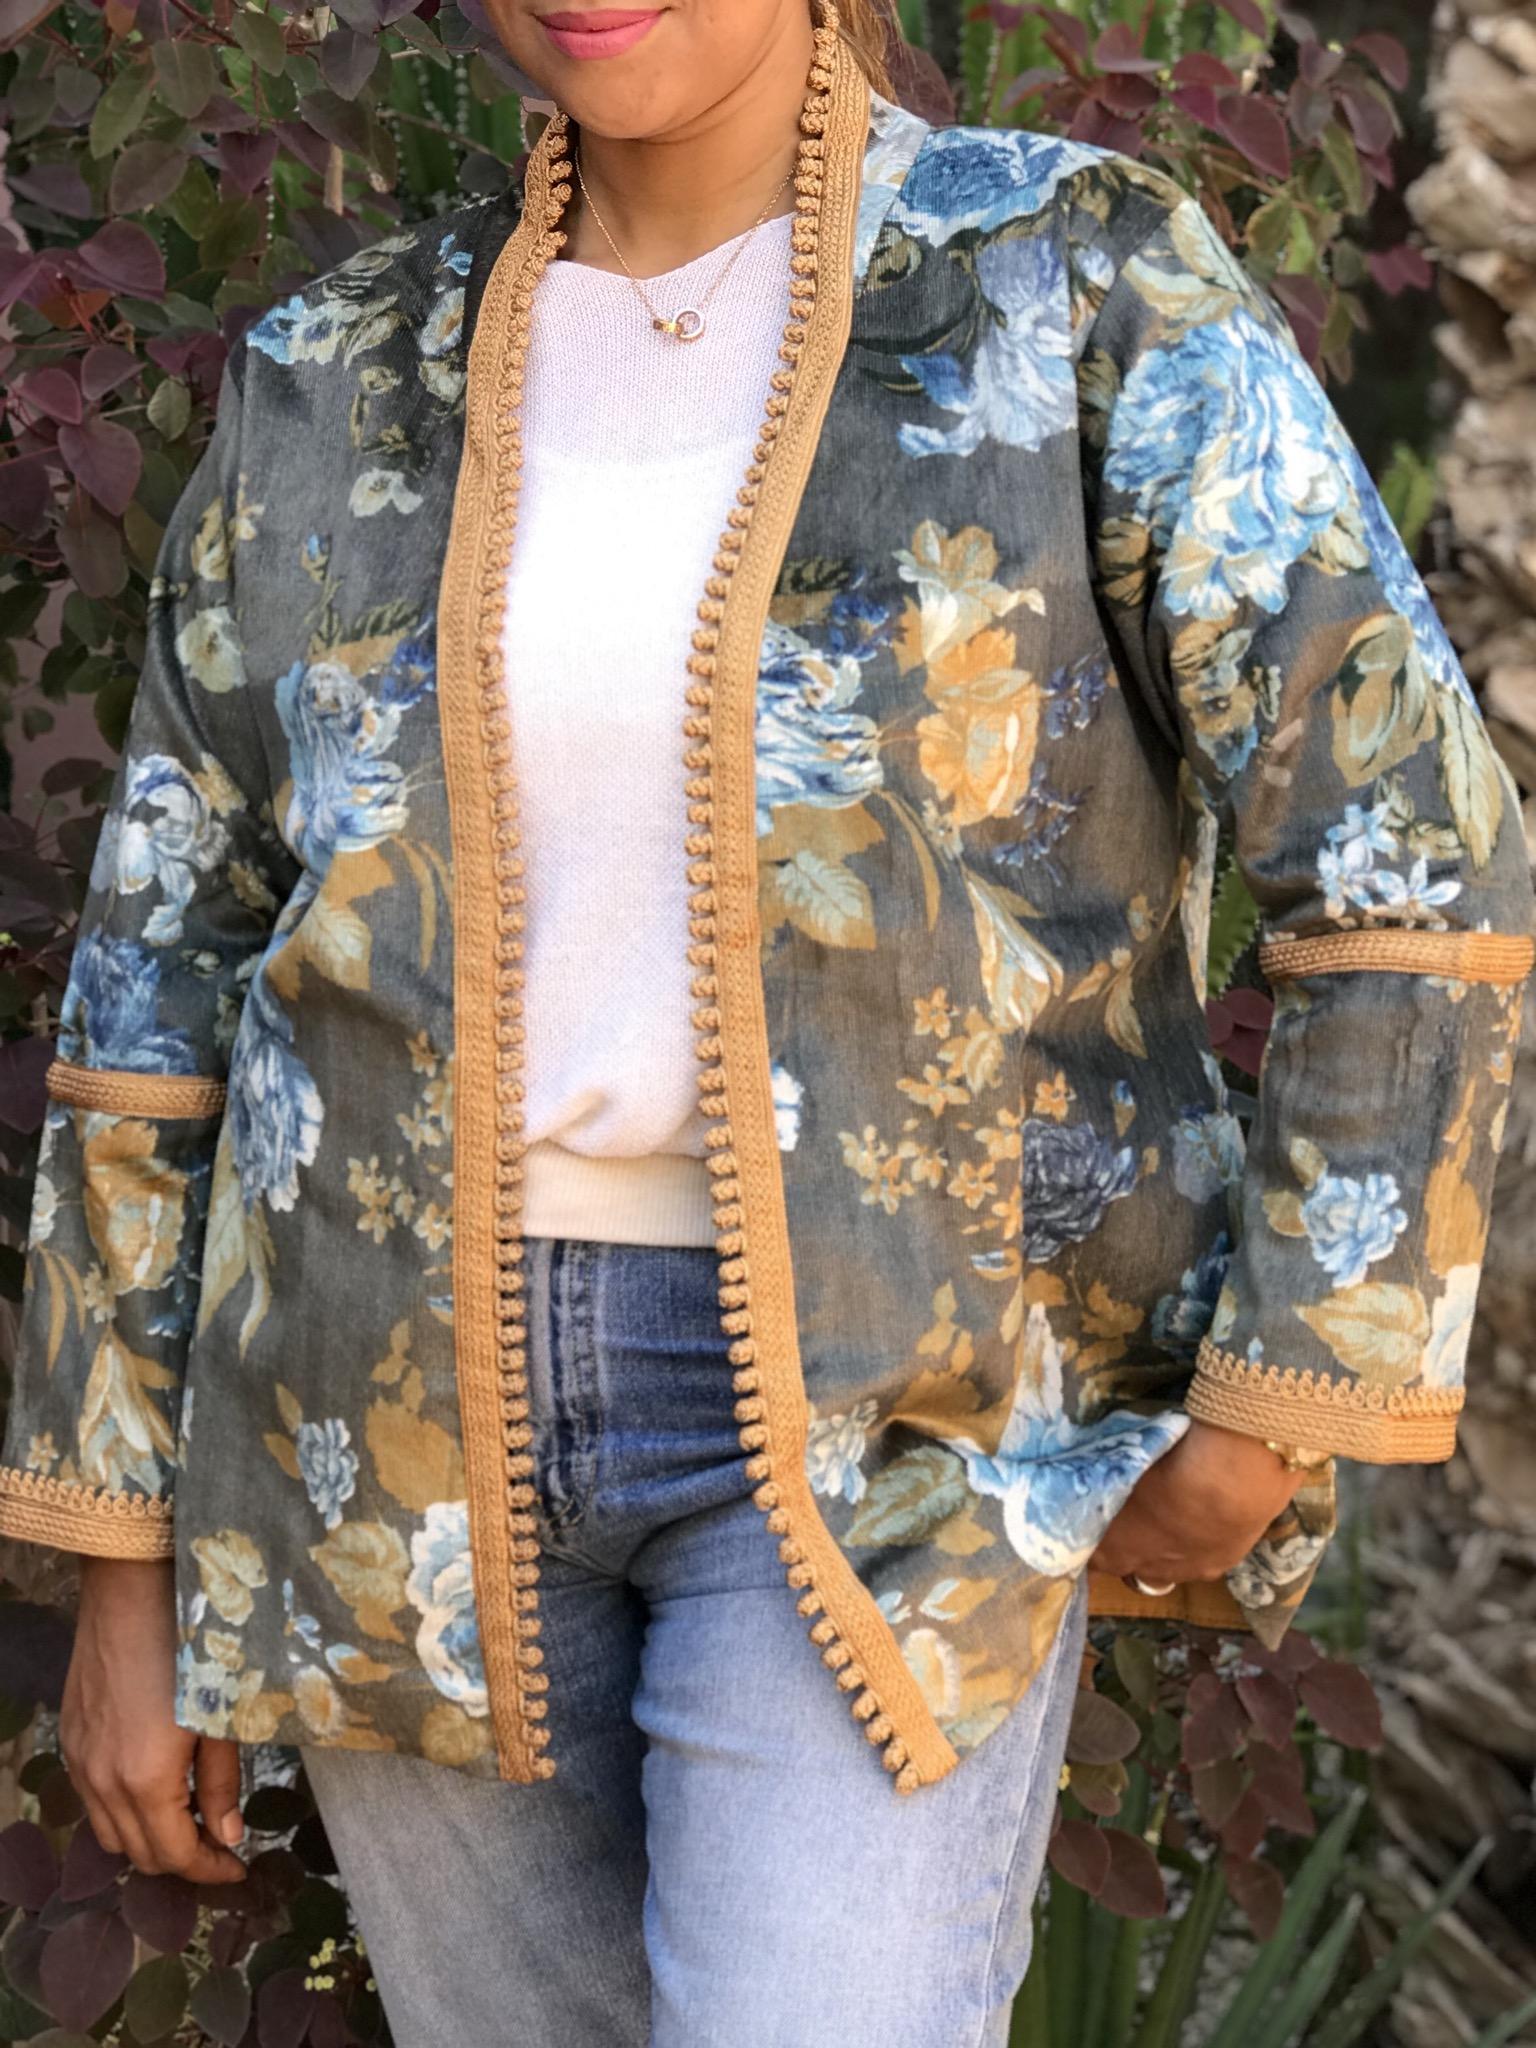 Jacket velvet with flower print blue grey mustard with Sfifa arms & Aqadi